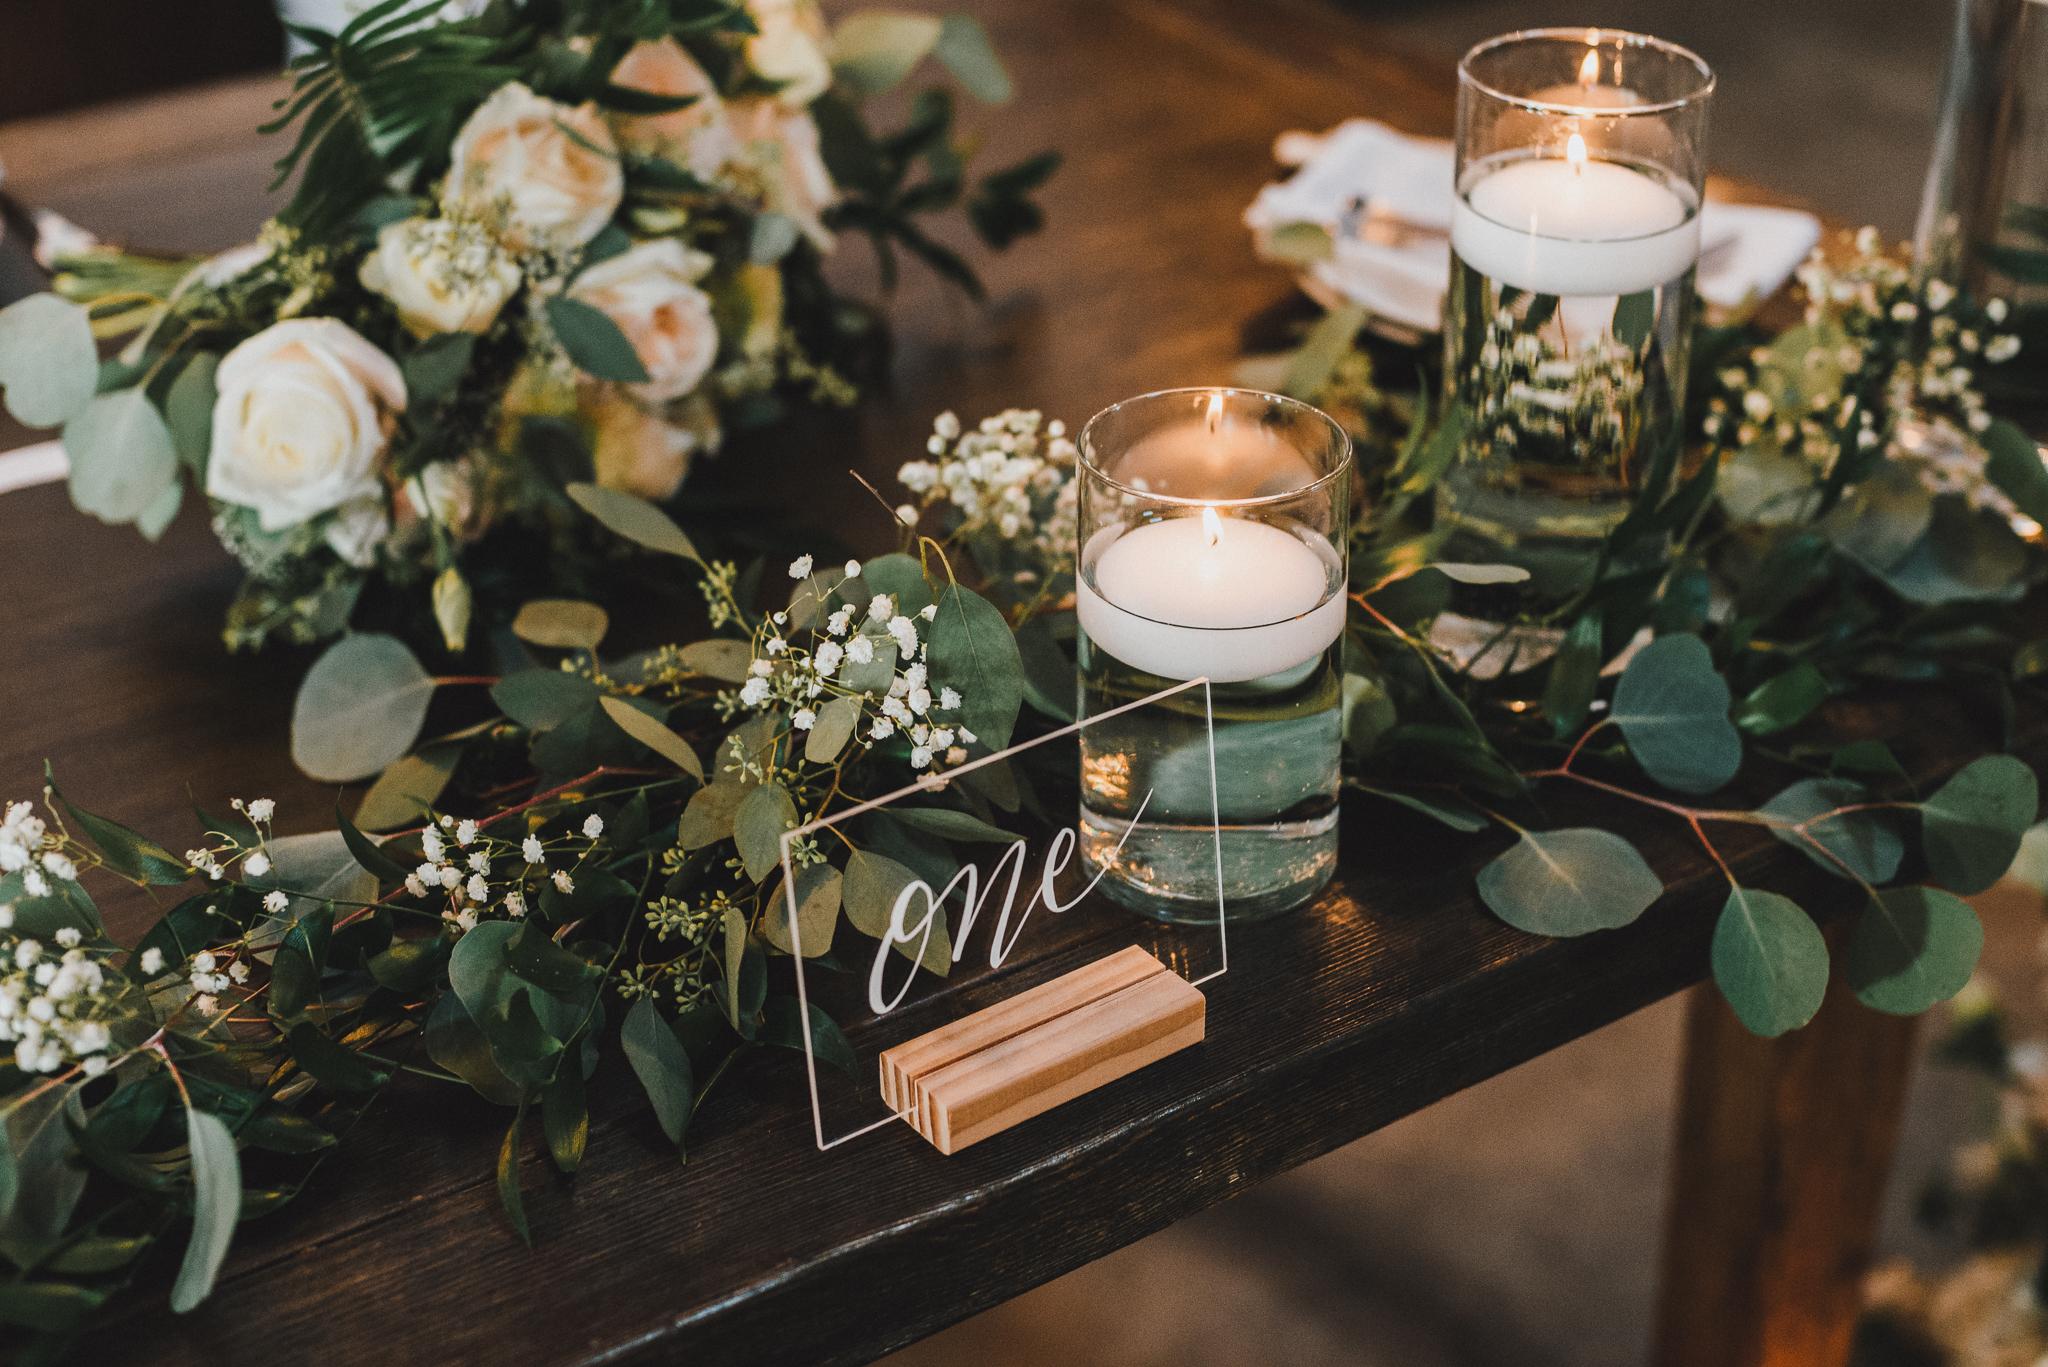 wellbrookwinerywedding-carrieaugustine-thekoebels-49.jpg